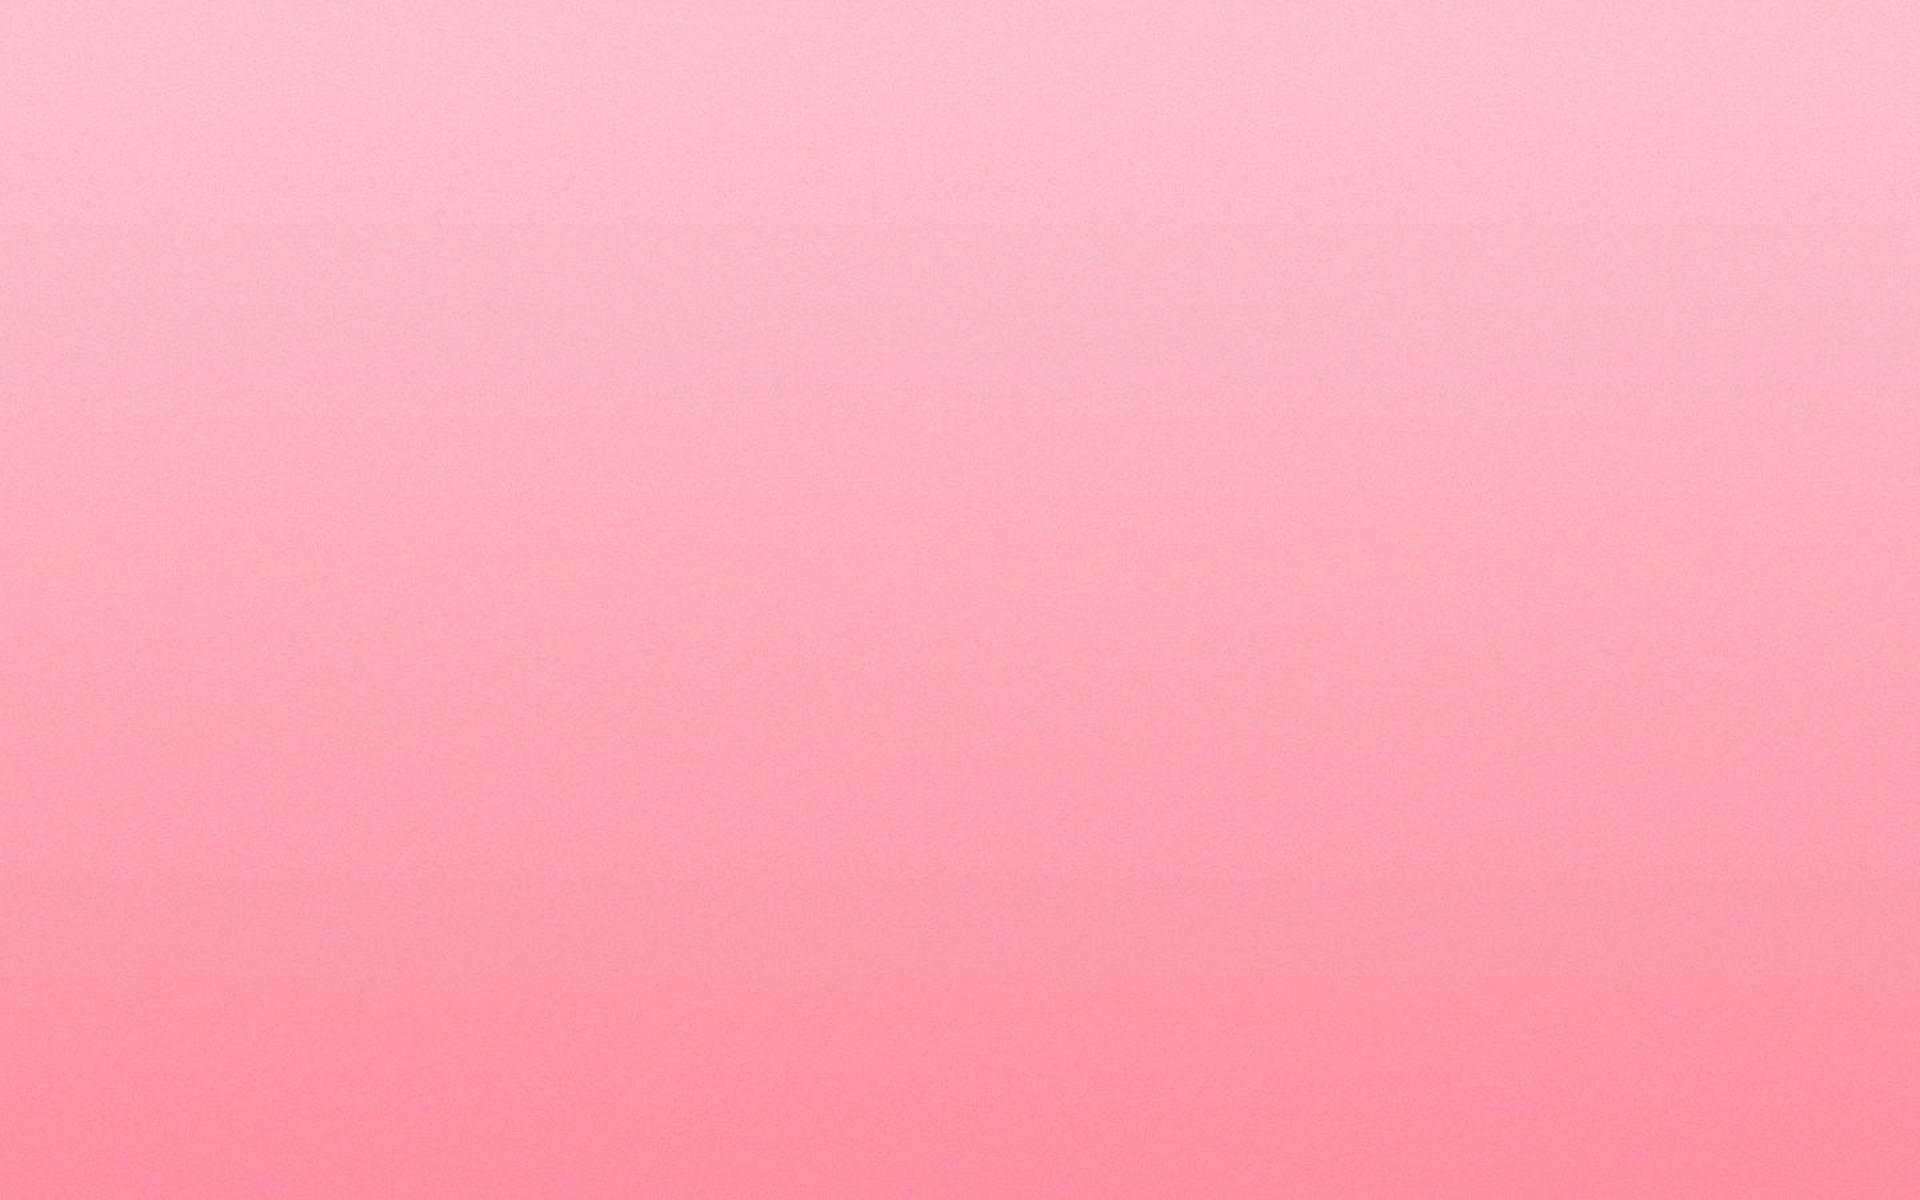 1920x1200 Android 30 pink wallpaper desktop PC and Mac wallpaper 1920x1200